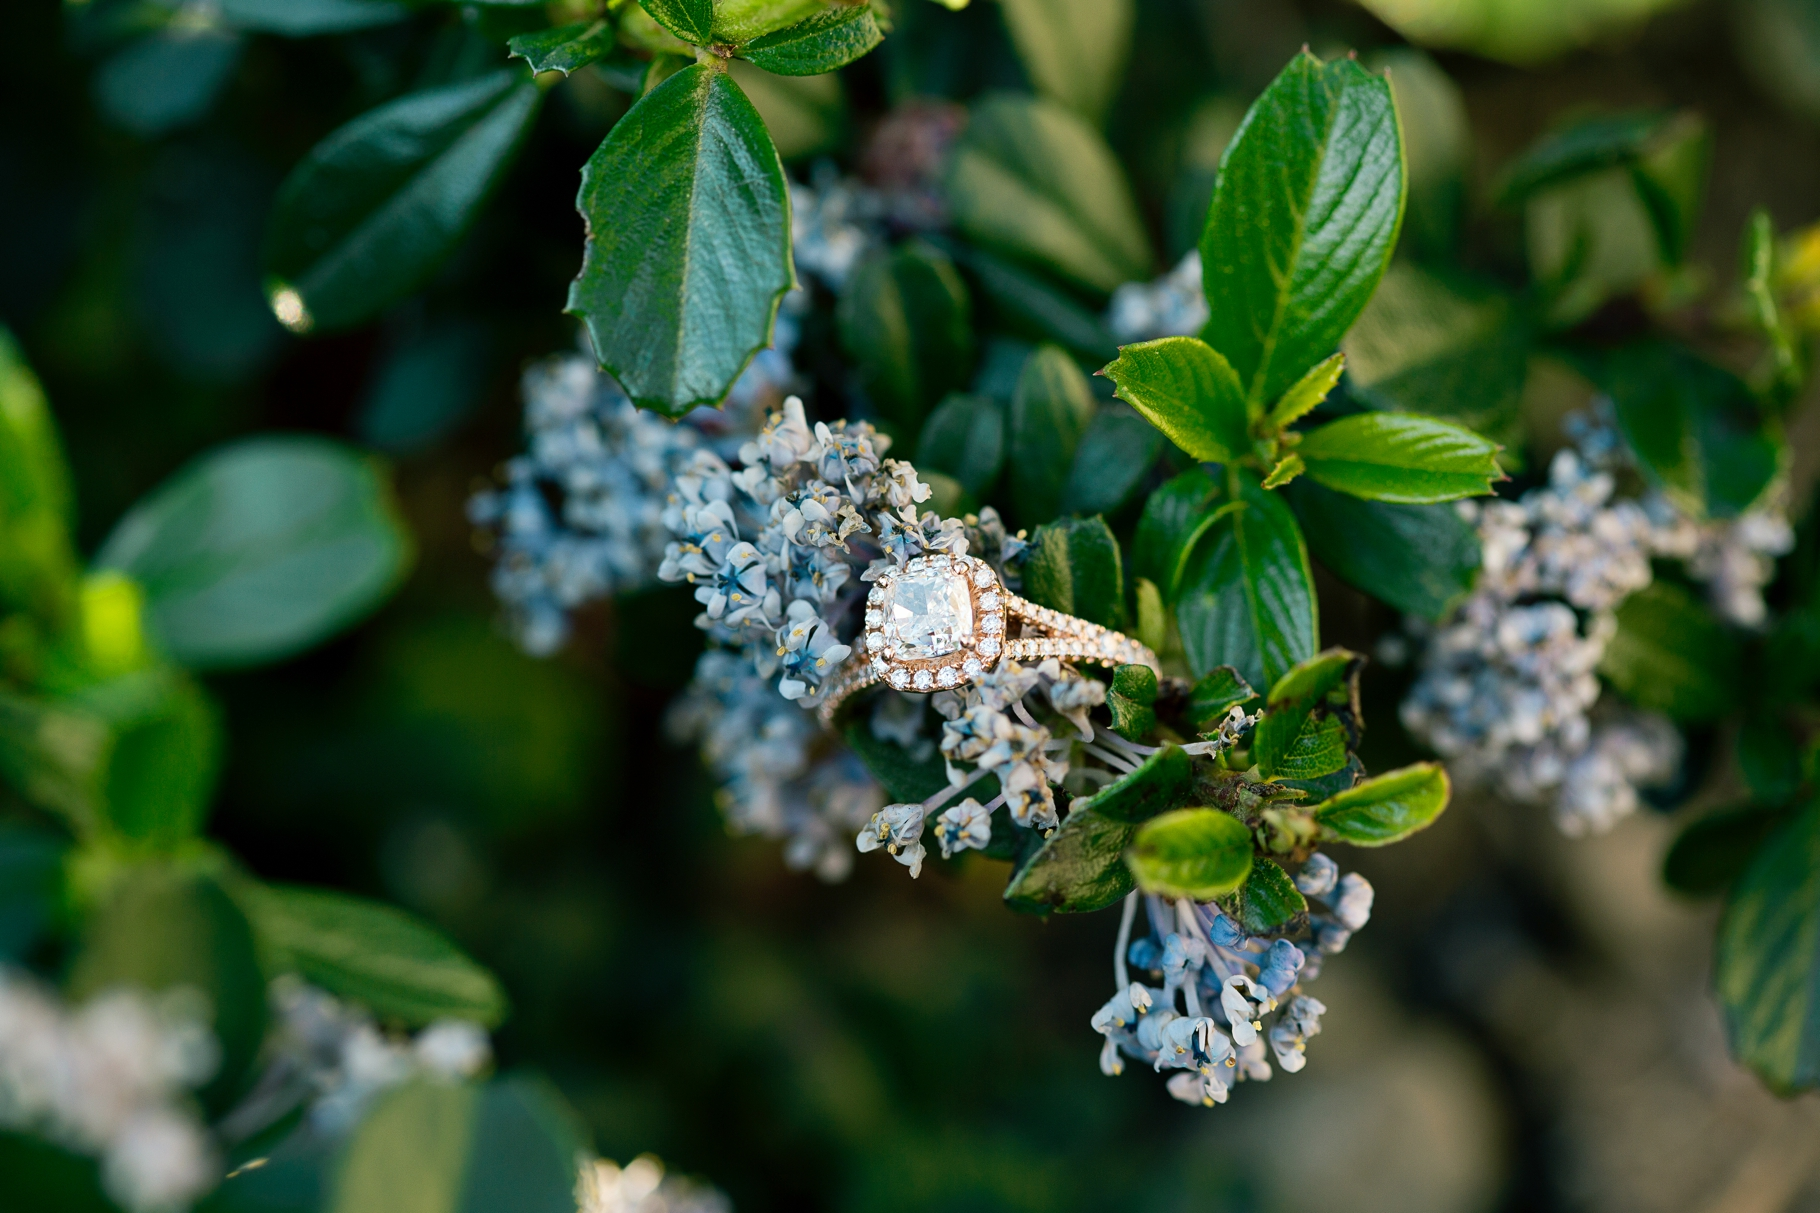 6-Engaged-Wedding-Ring-Diamond-Seattle-Waterfront-Myrtle-Edwards-Park-Flowers-Elliot-Bay-Trail-Enagement-Photographer-Wedding-Photography-by-Betty-Elaine